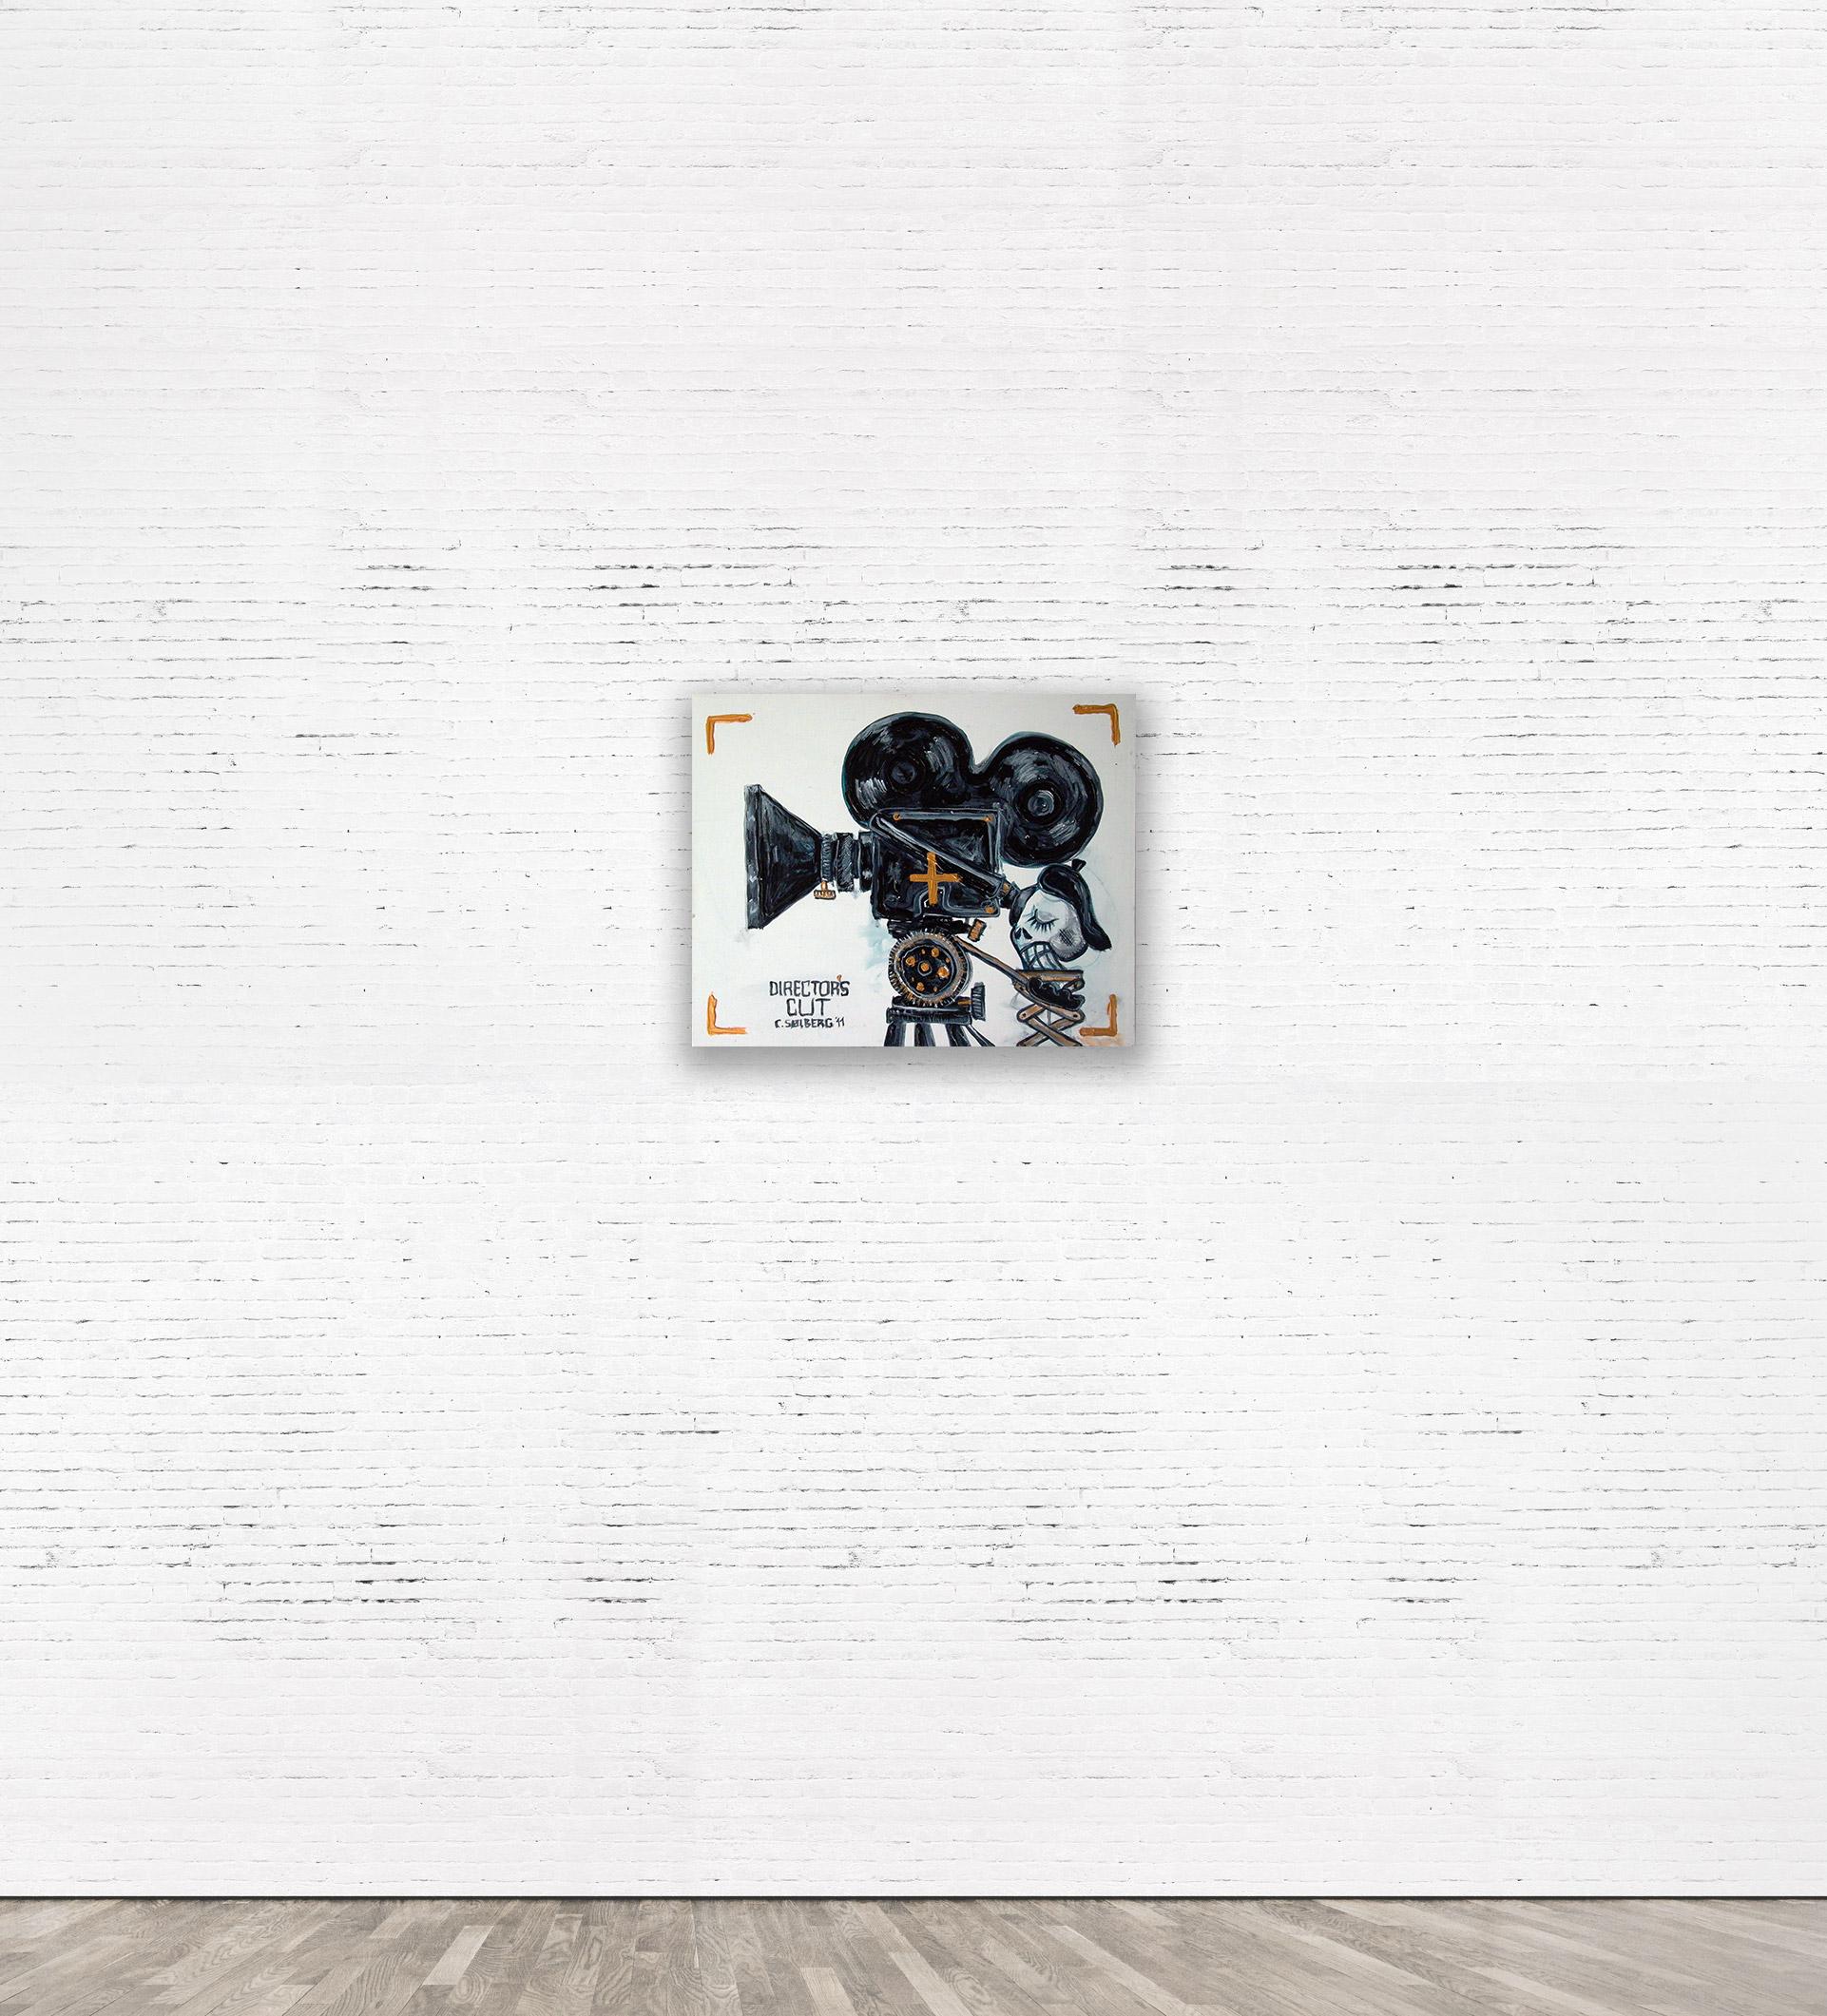 """DIRECTORS CUT""  2011 Acrylic on canvas 50 x 40 cm   SOLD."